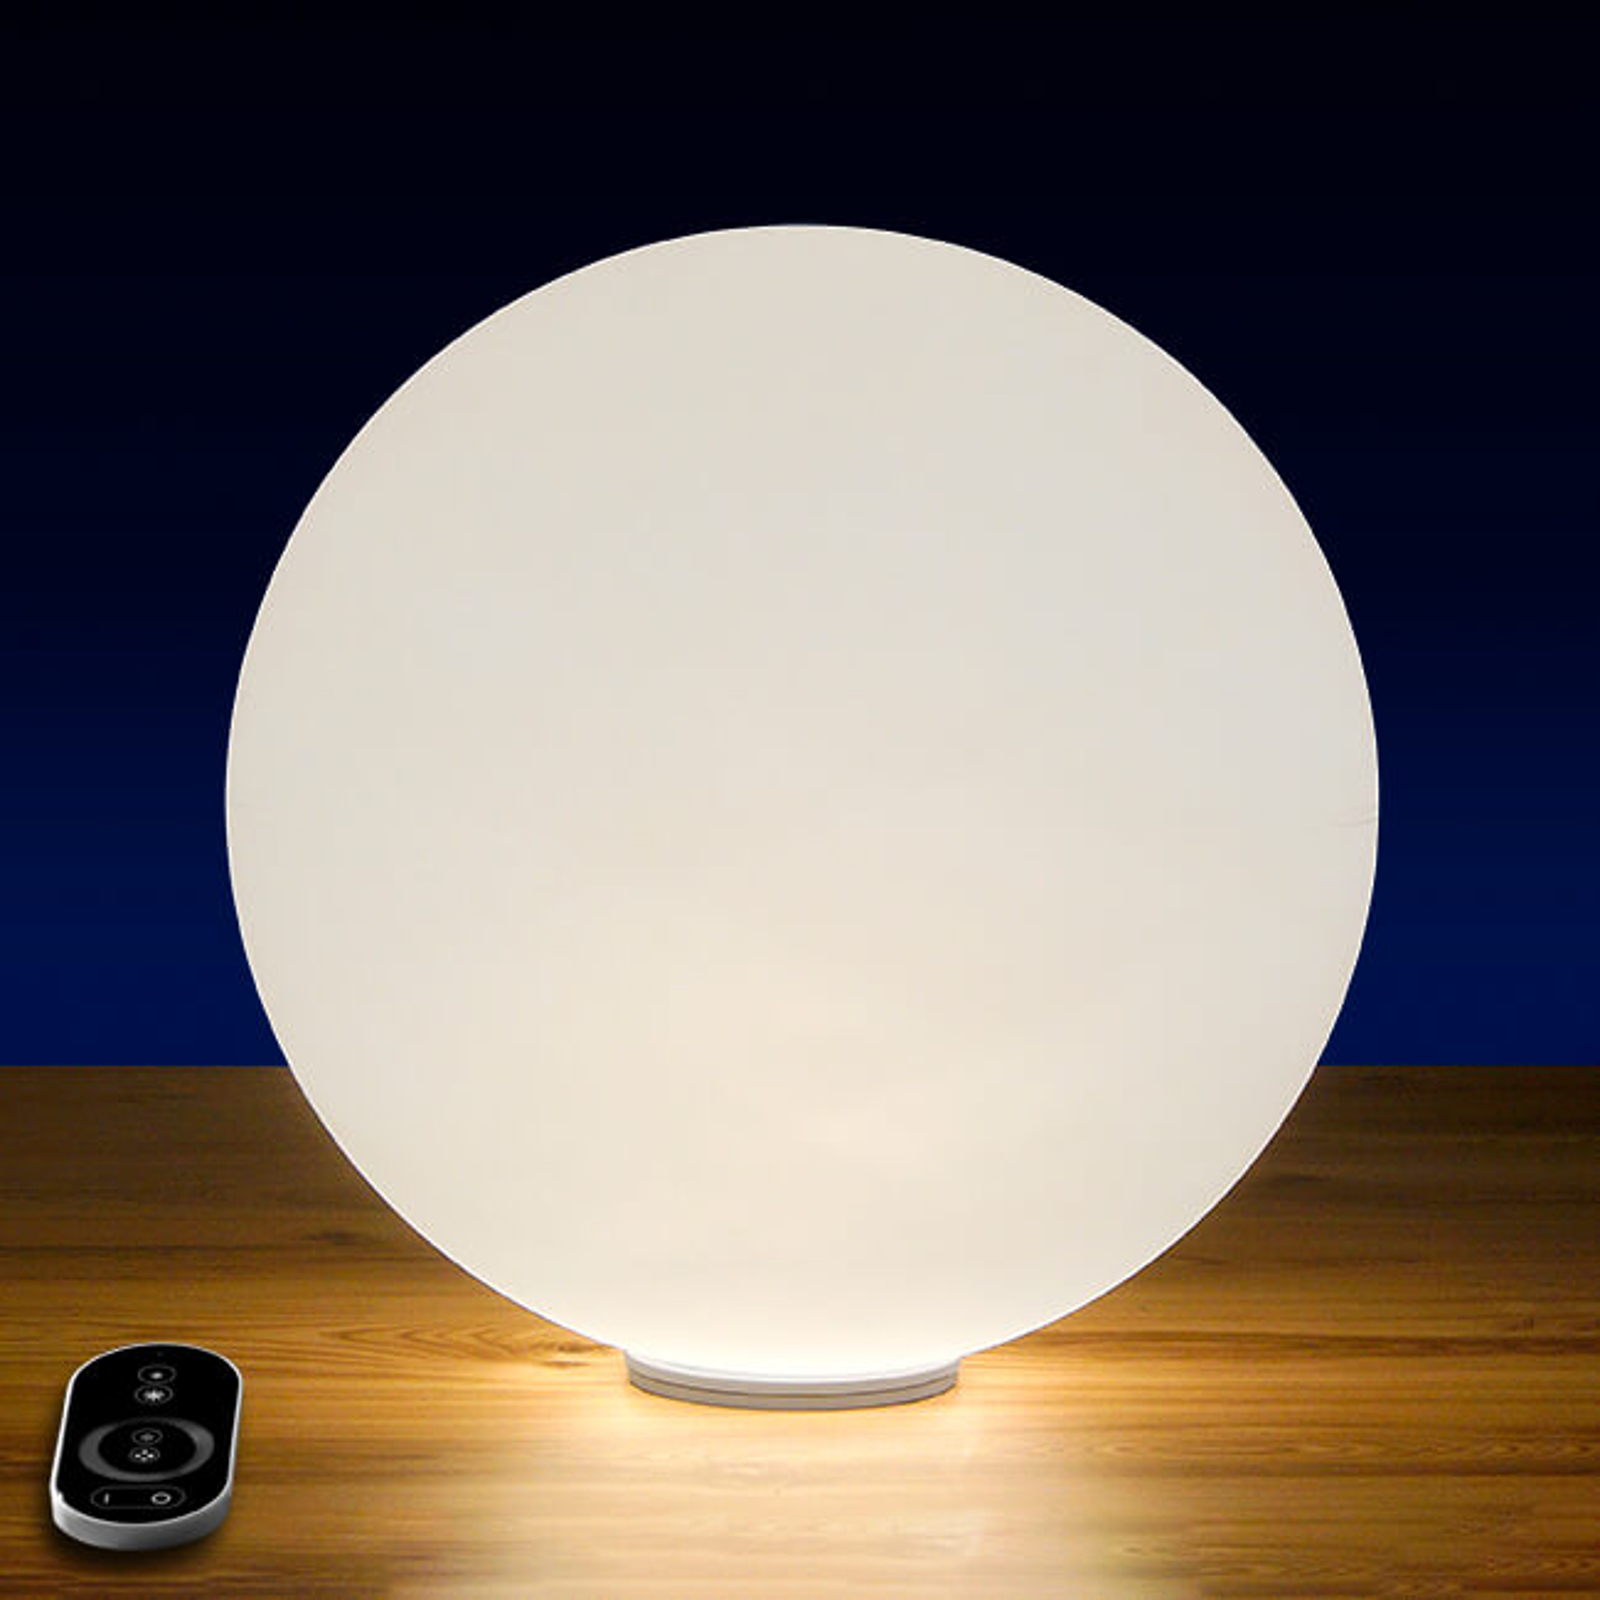 Dimbar LED-kulelampe Snowball med batteri 30 cm